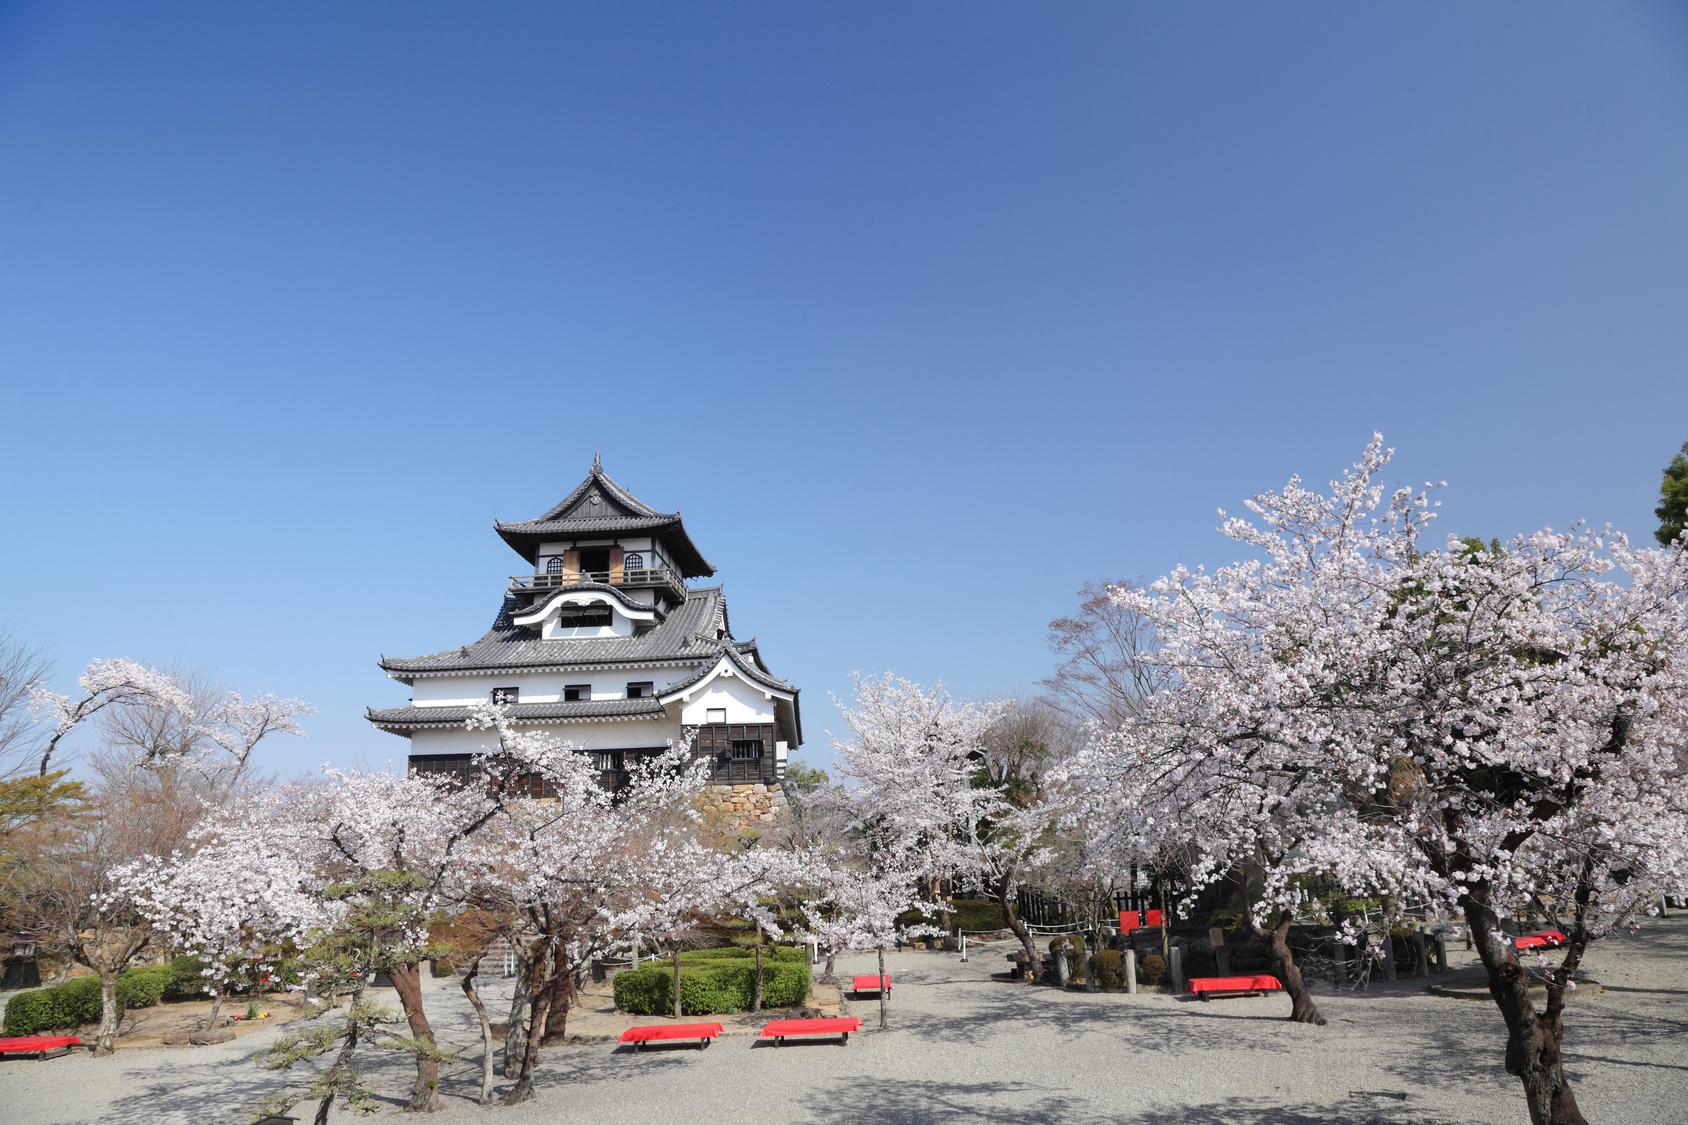 犬山城の漆喰